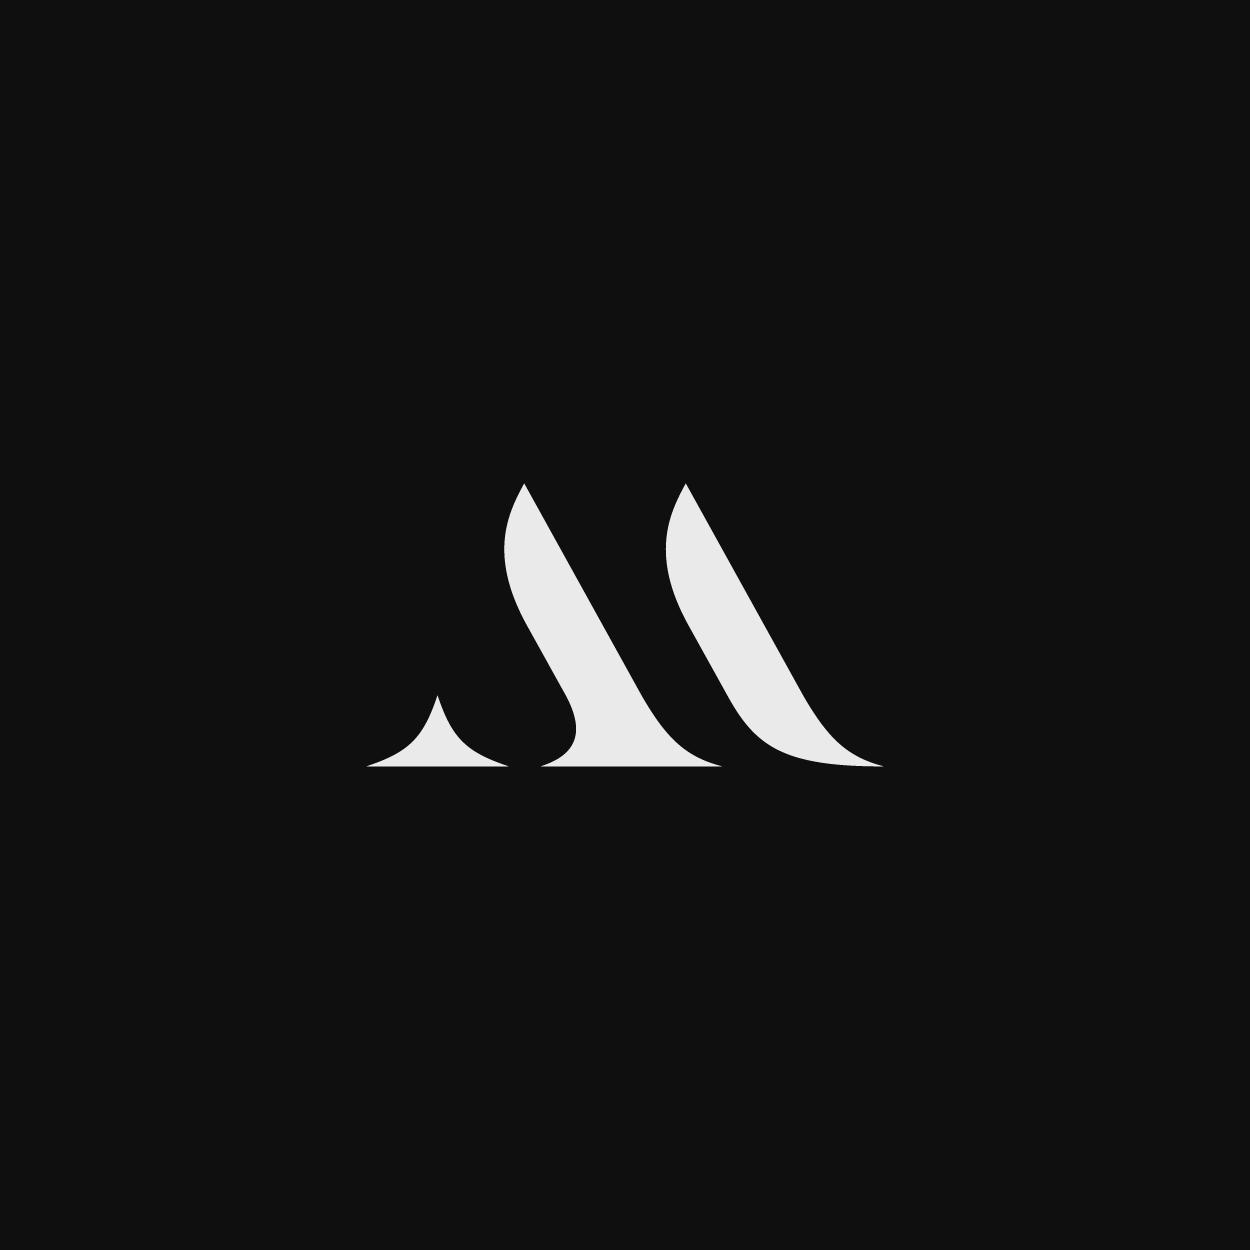 Sylvan_Logofolio2019_Artboard 118 copy1250.jpg